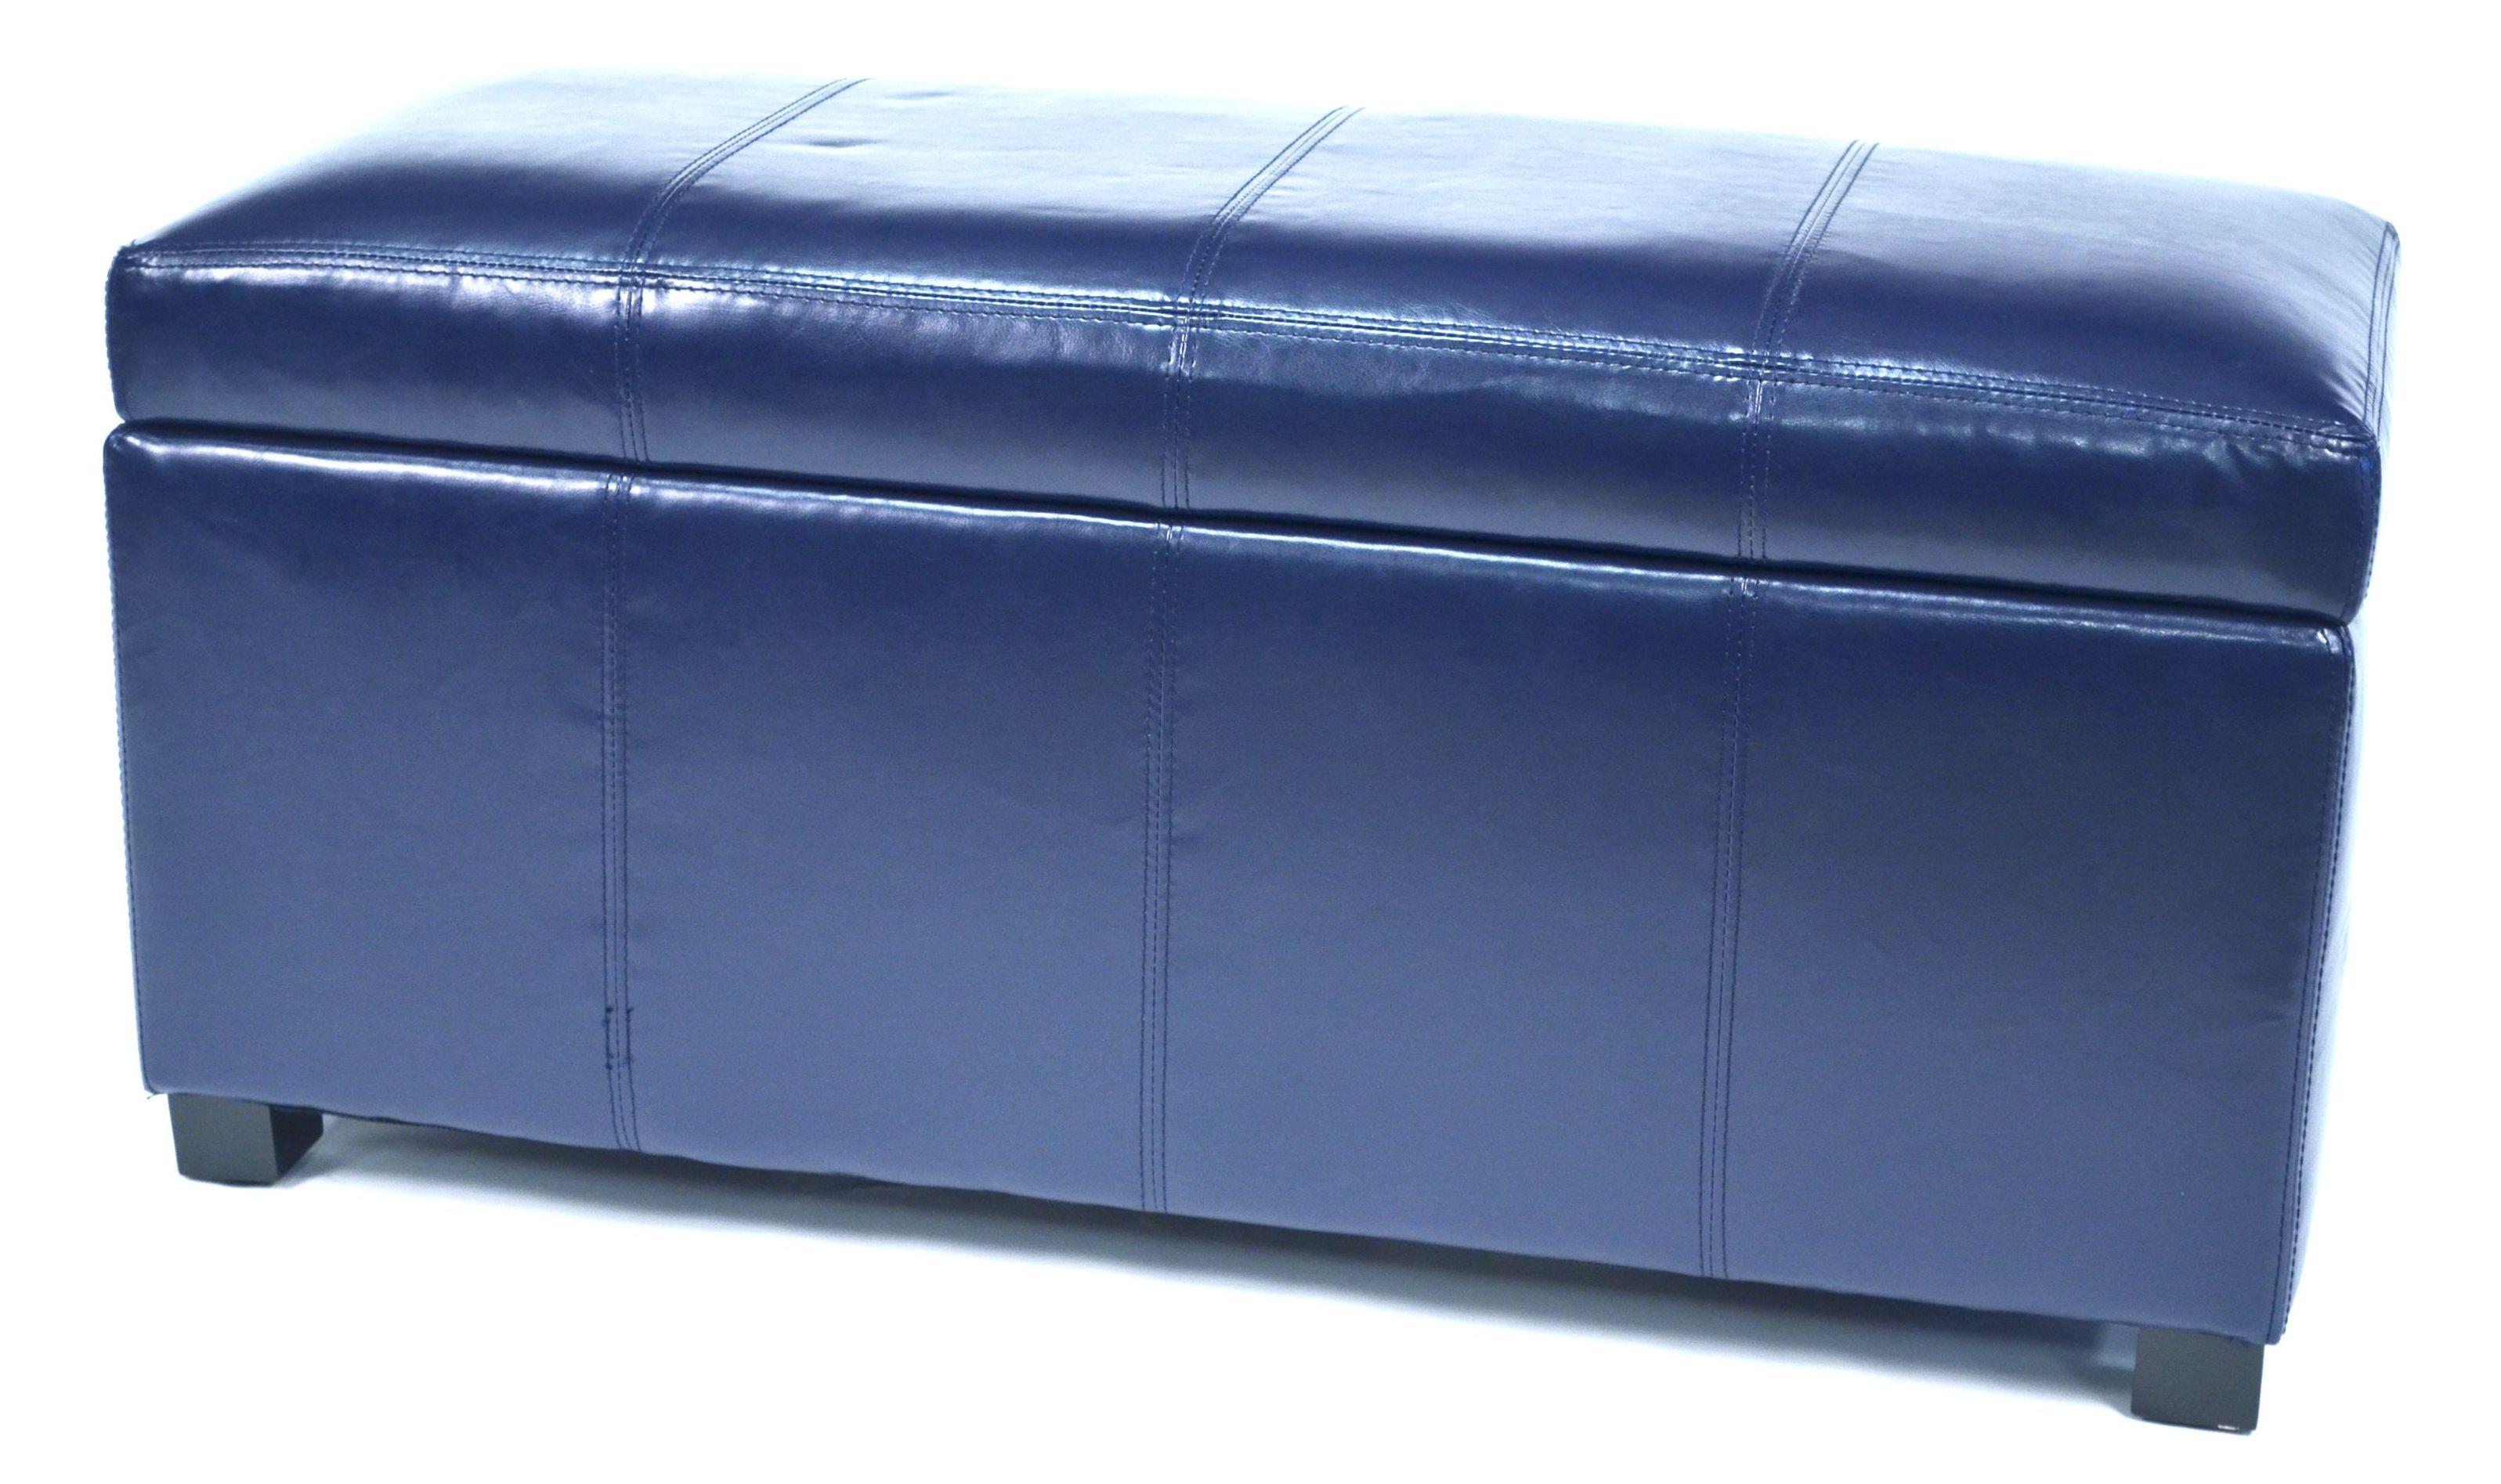 Ariel Dark Blue Faux Leather Storage Bench Wt M1157 Drk Blue Warehouse Of Tiffany